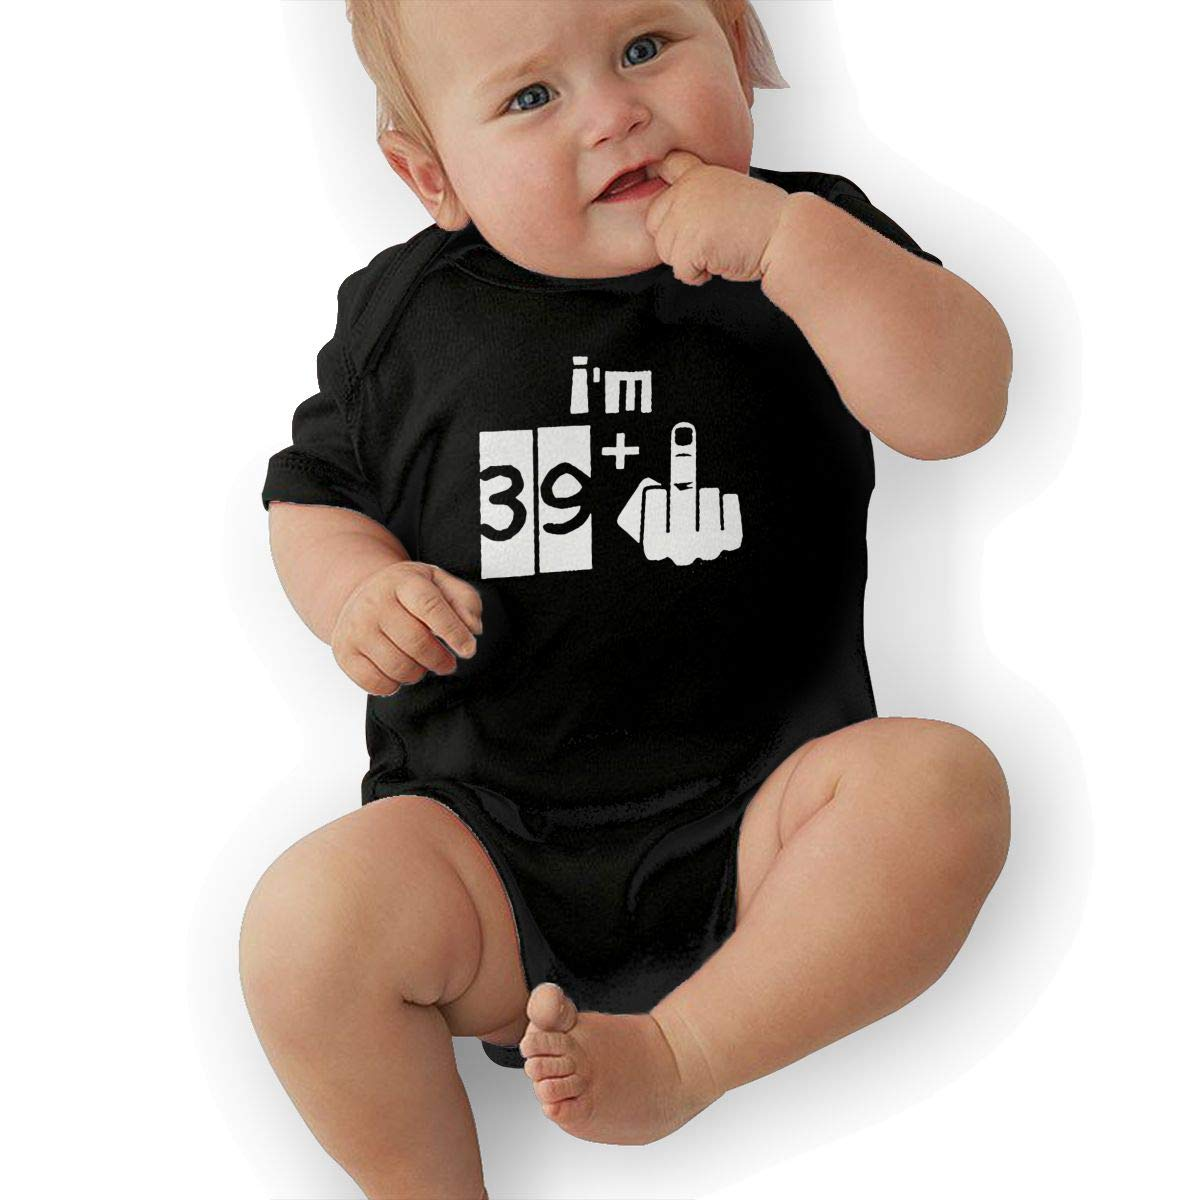 U88oi-8 Short Sleeve Cotton Bodysuit for Baby Boys and Girls Soft Im 39 Plus 1 40th Birthday Onesies